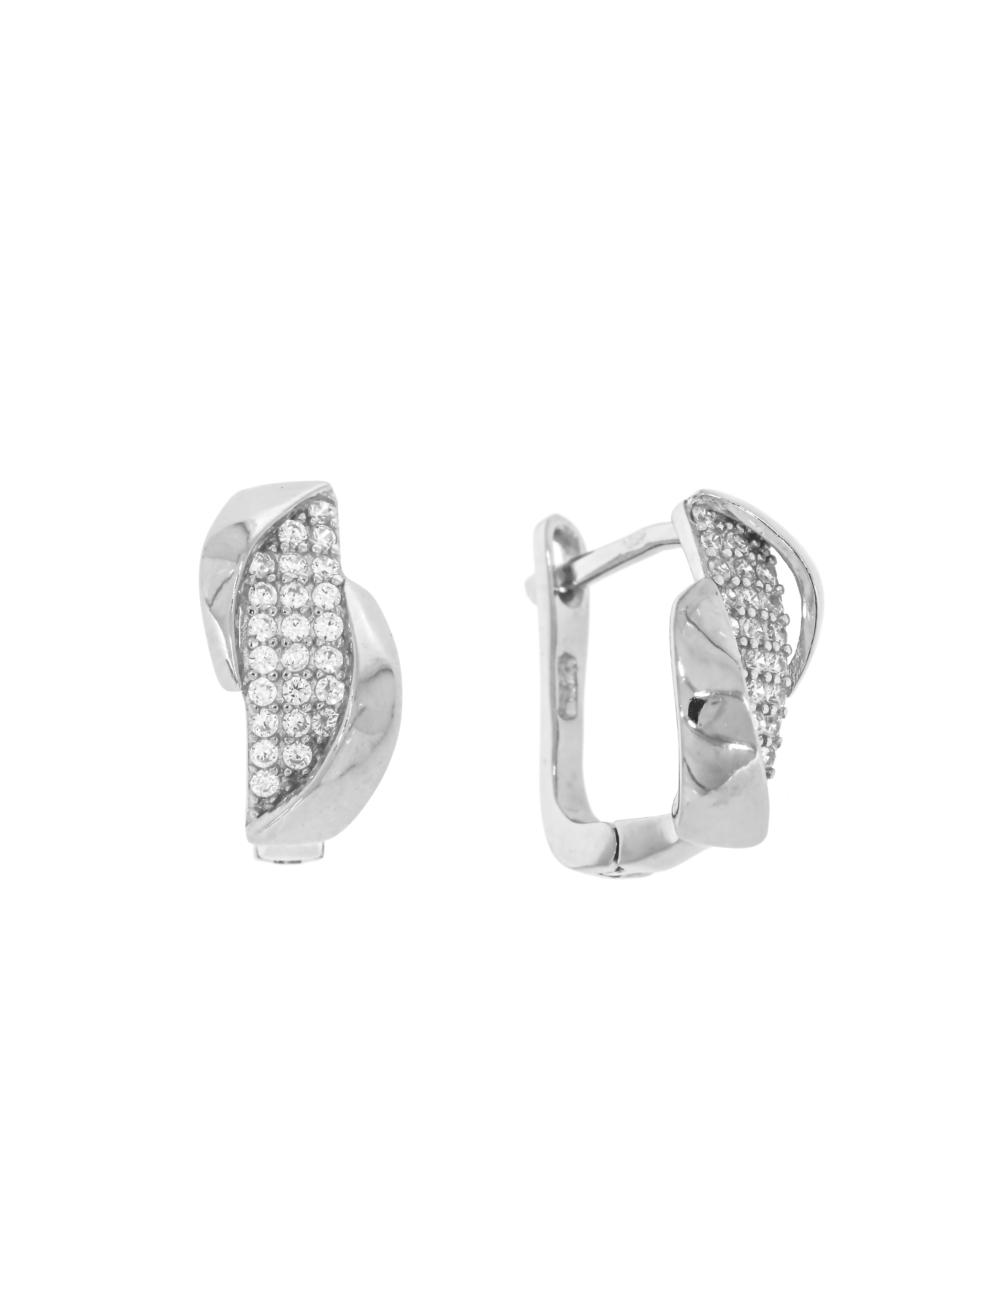 10011914  Kolczyki srebrne pr.925 z cyrkoniami